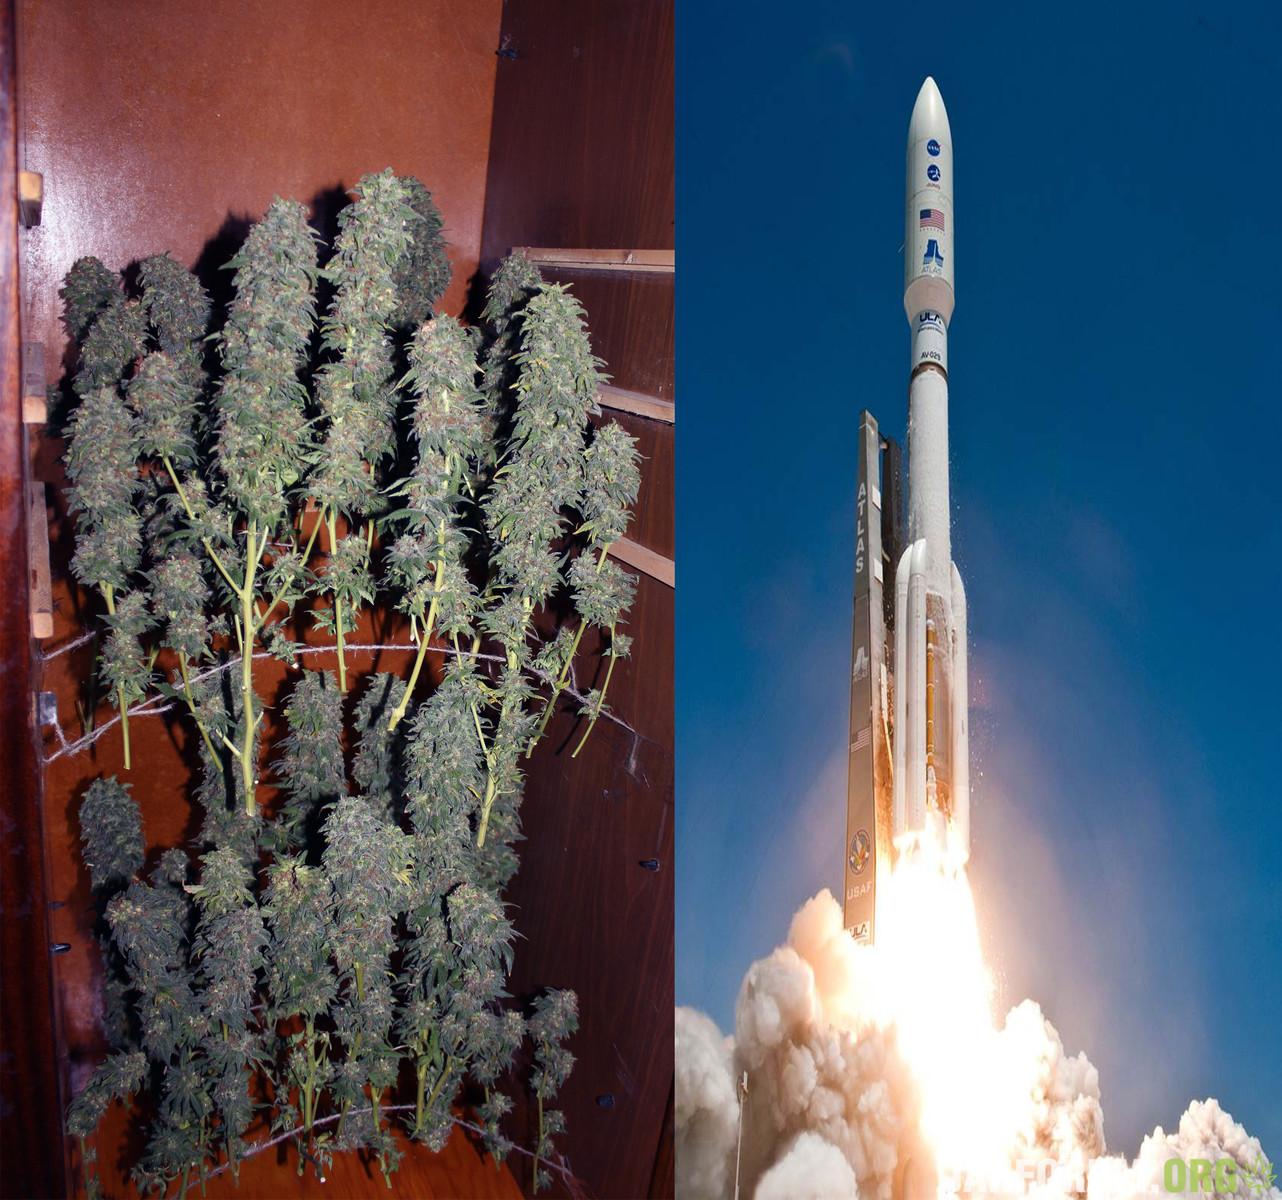 Forward in Space!